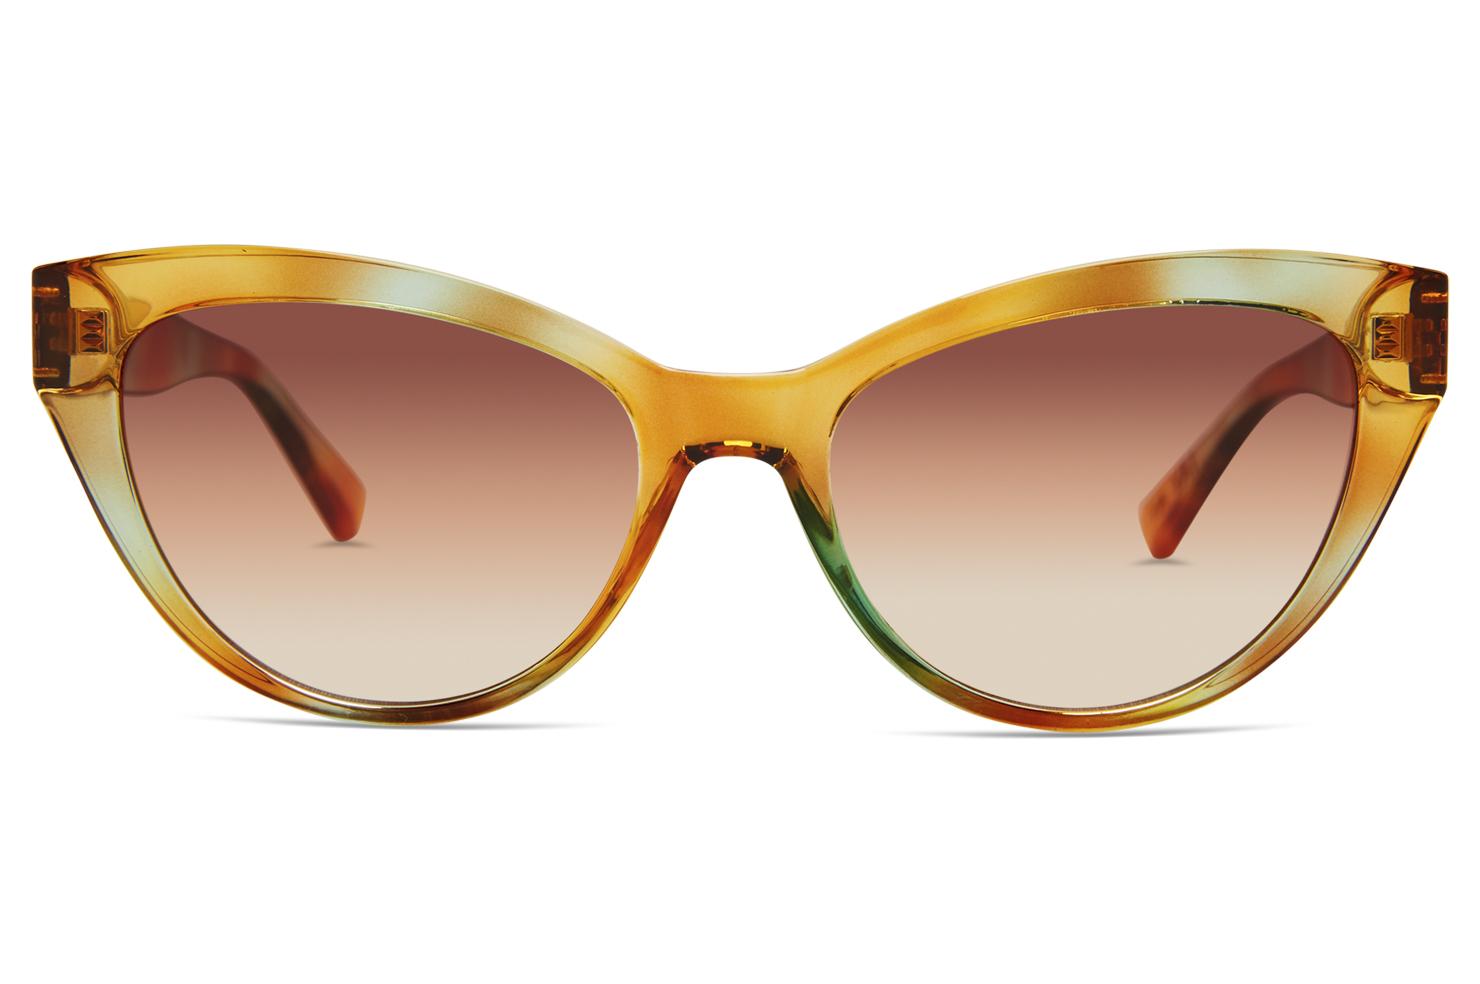 Von Zipper SS21 Sunglasses Preview